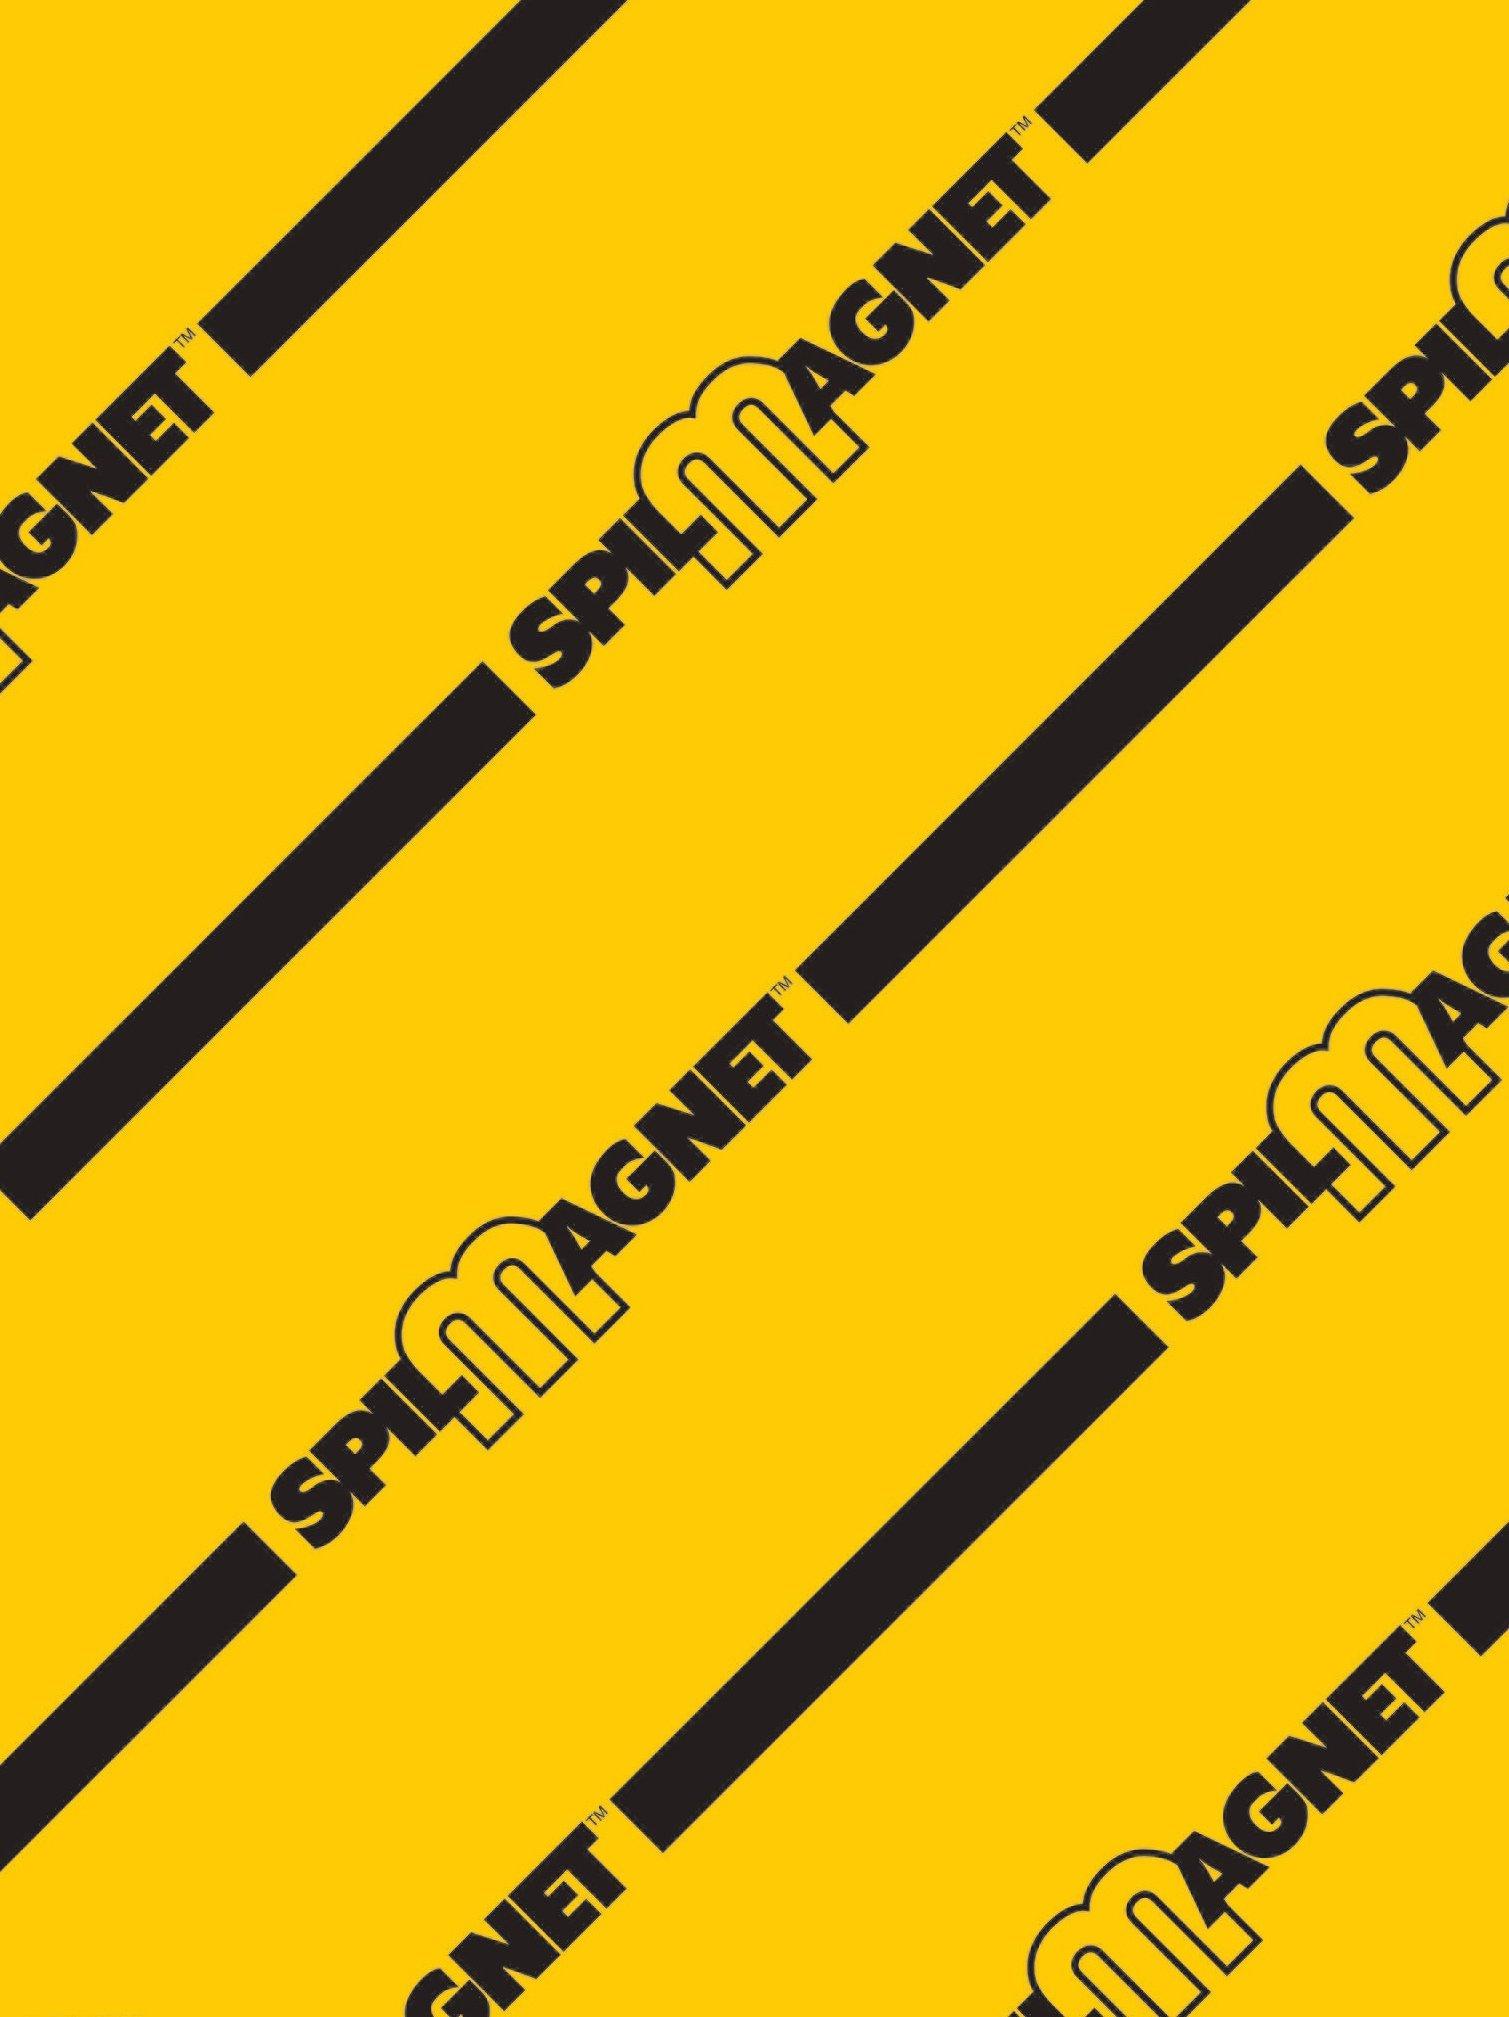 Brady 31112LS Vinyl Magnetic Drain Cover, 36'' L x 24'' W, Black/Yellow